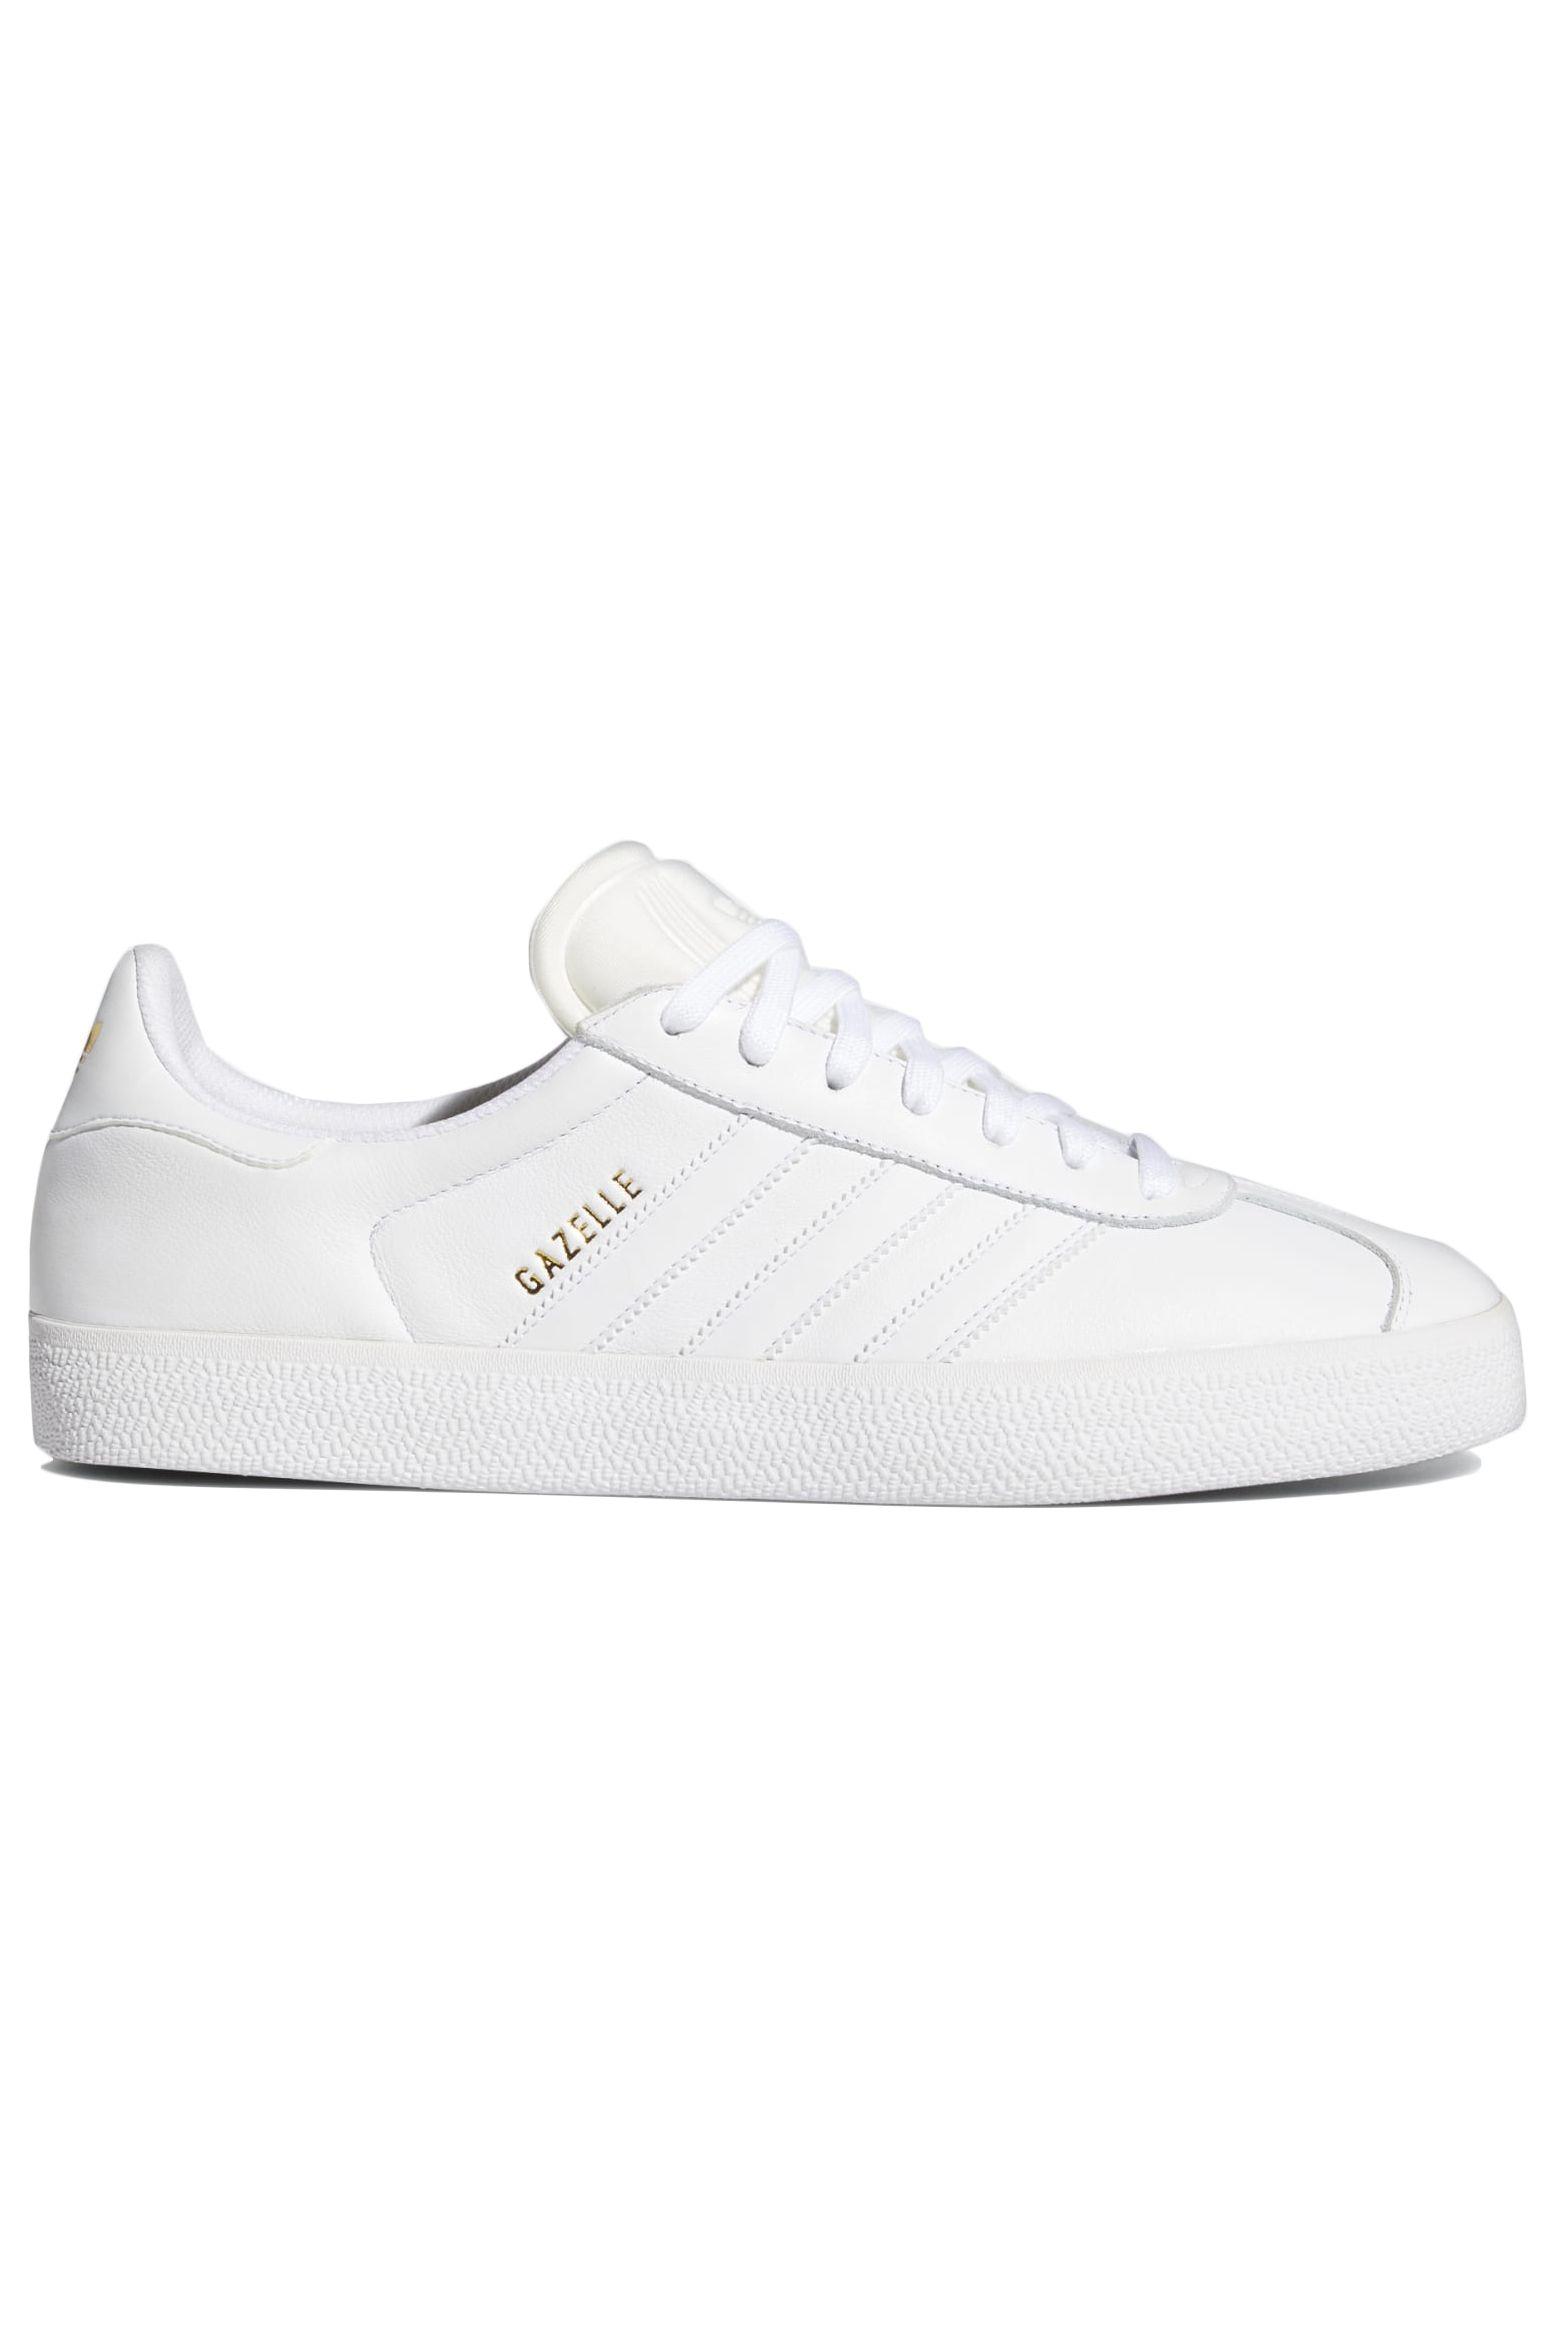 Adidas Shoes GAZELLE ADV Ftwr White/Ftwr White/Gold Met.